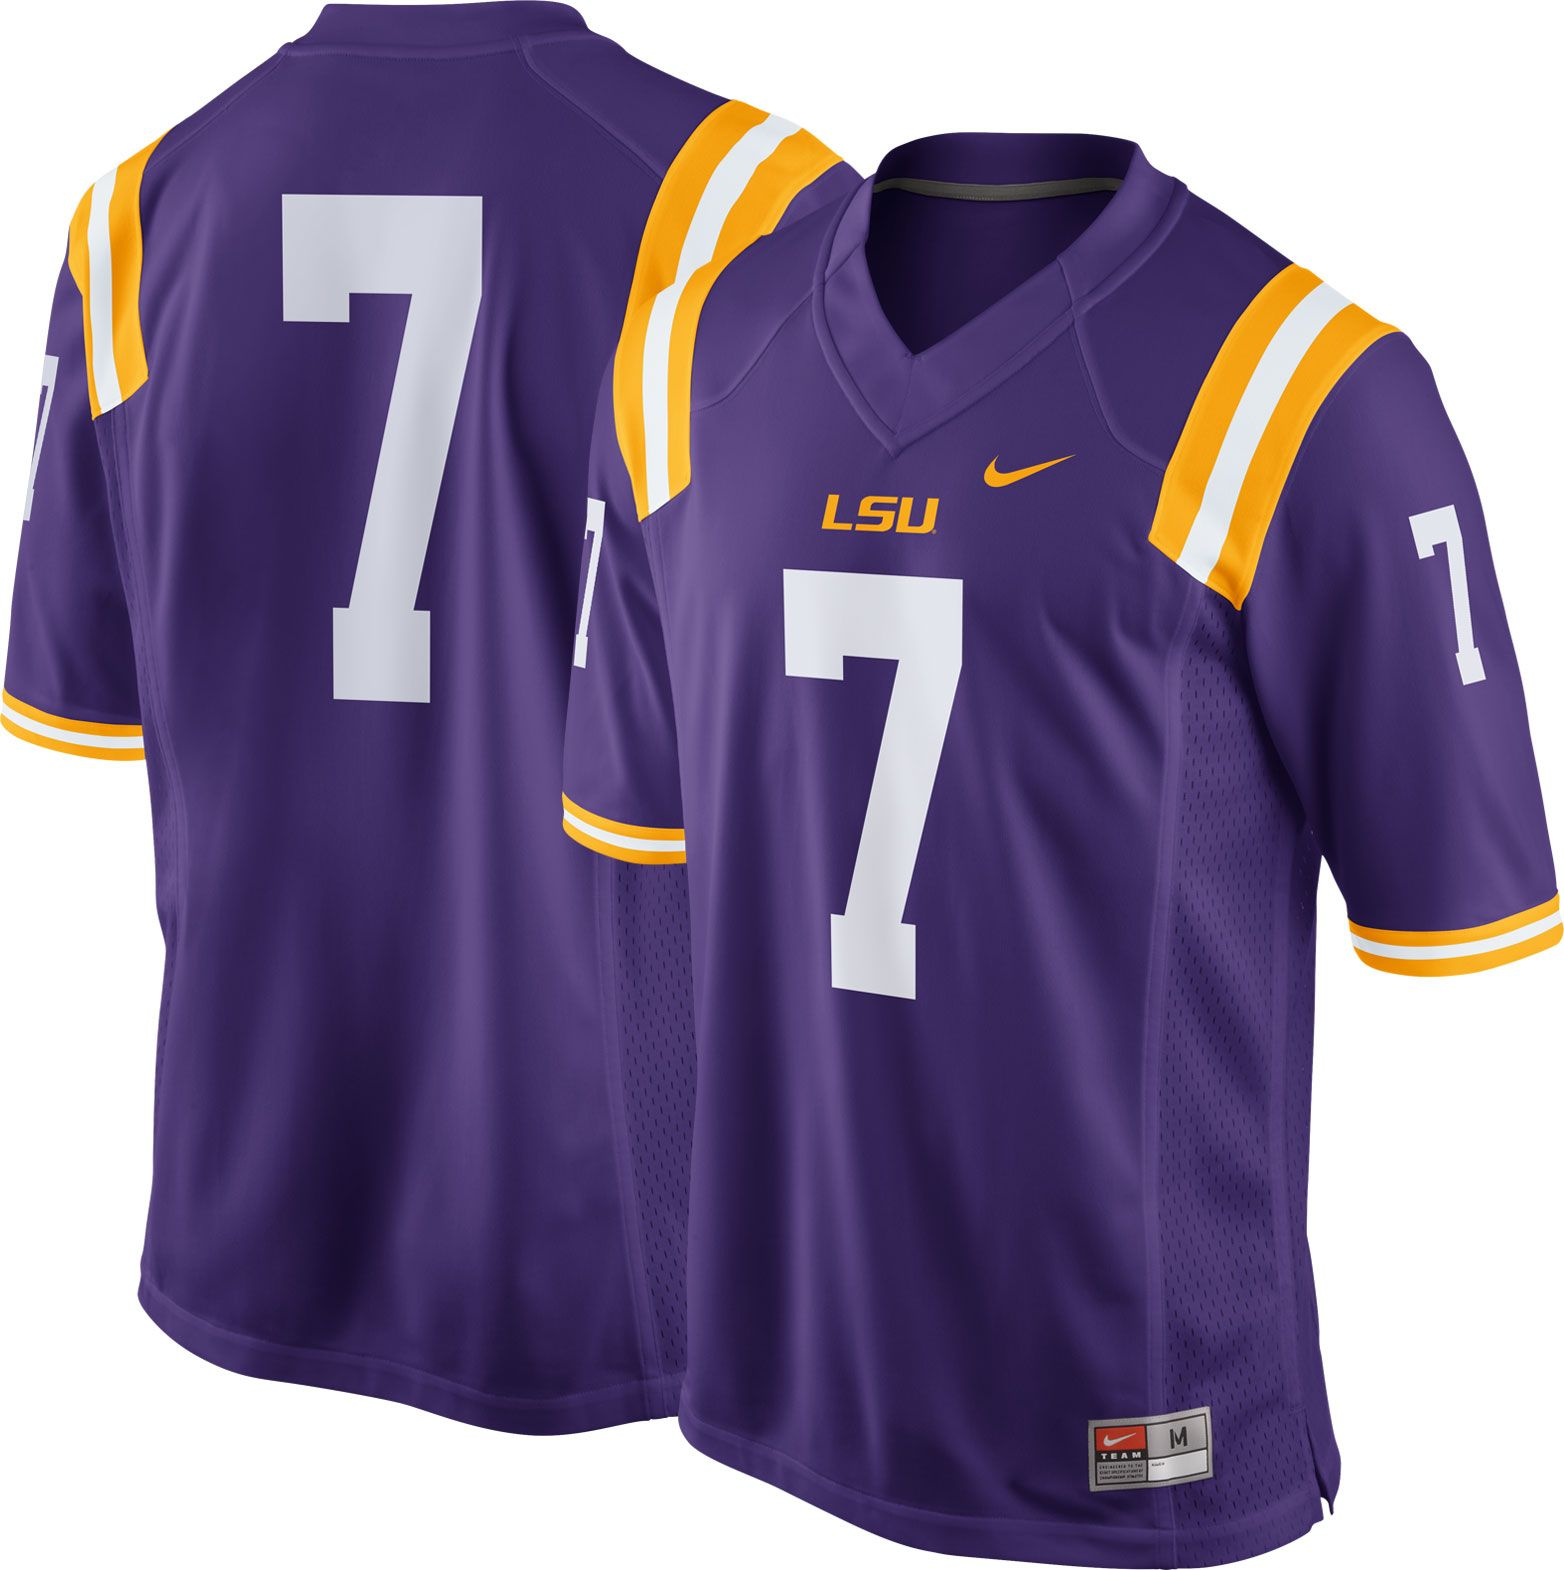 524da019da5b Nike Men's LSU Tigers #7 Purple Game Football Jersey | DICK'S ...